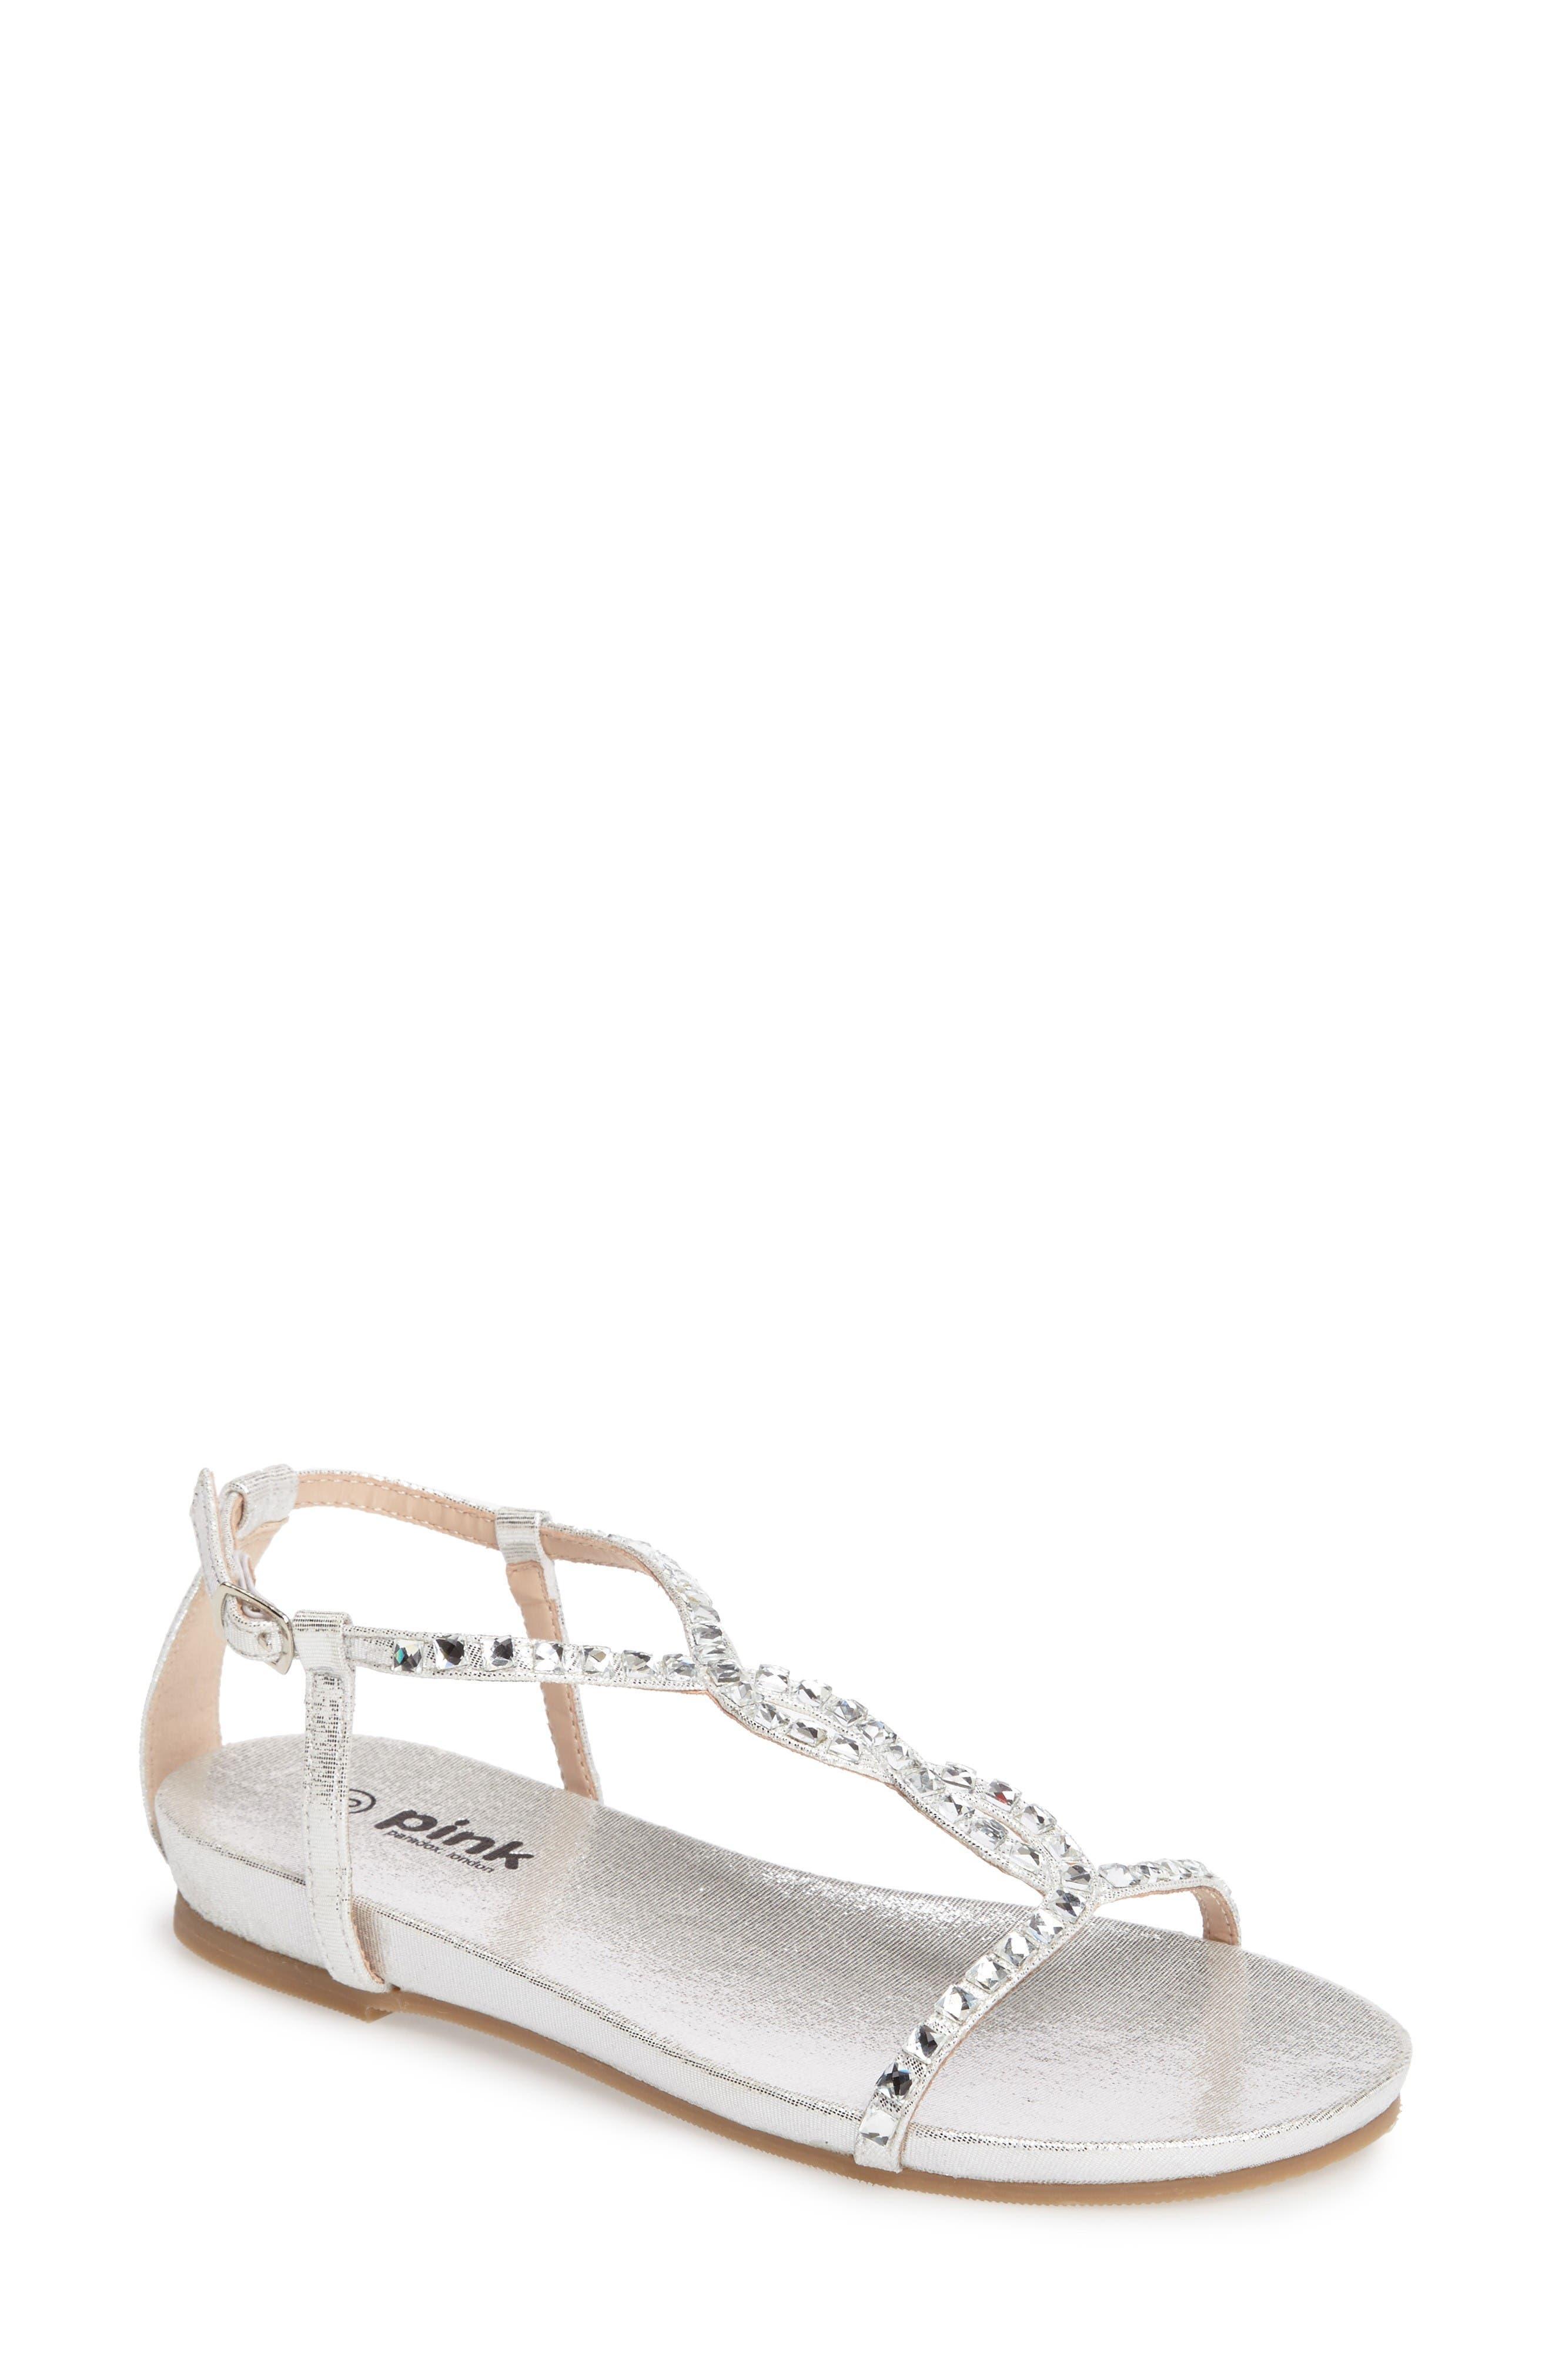 Kaylee Ankle Strap Sandal,                             Main thumbnail 1, color,                             Silver